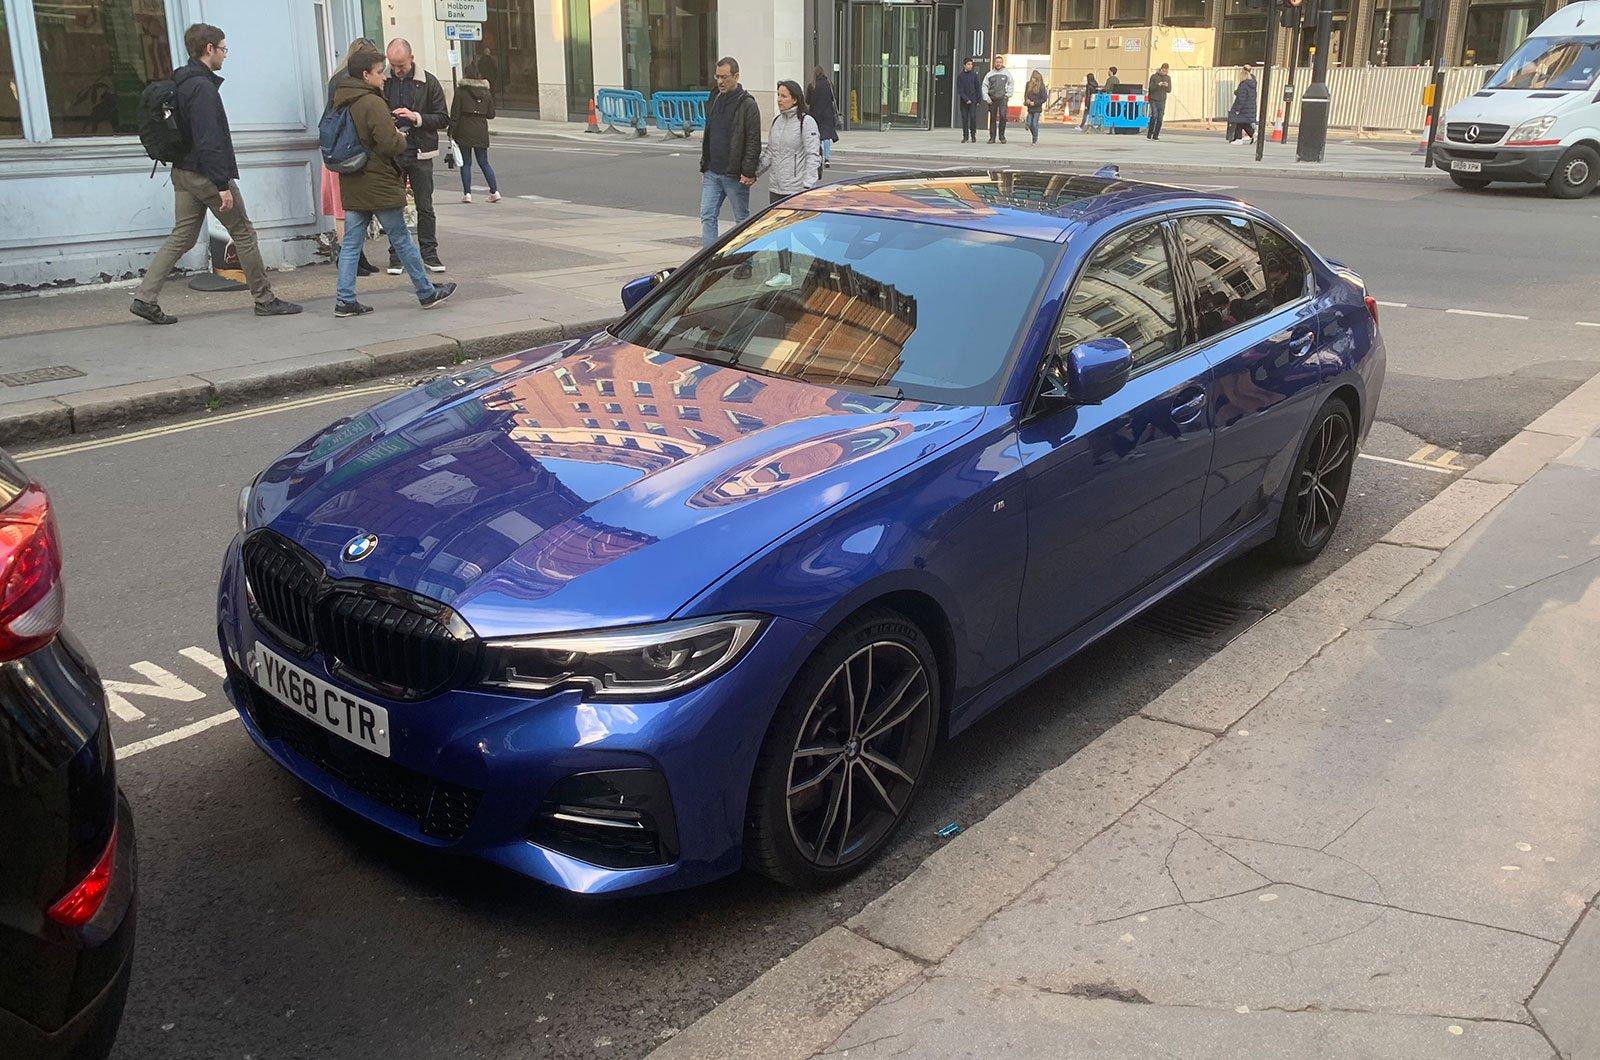 BMW 3 Series parked